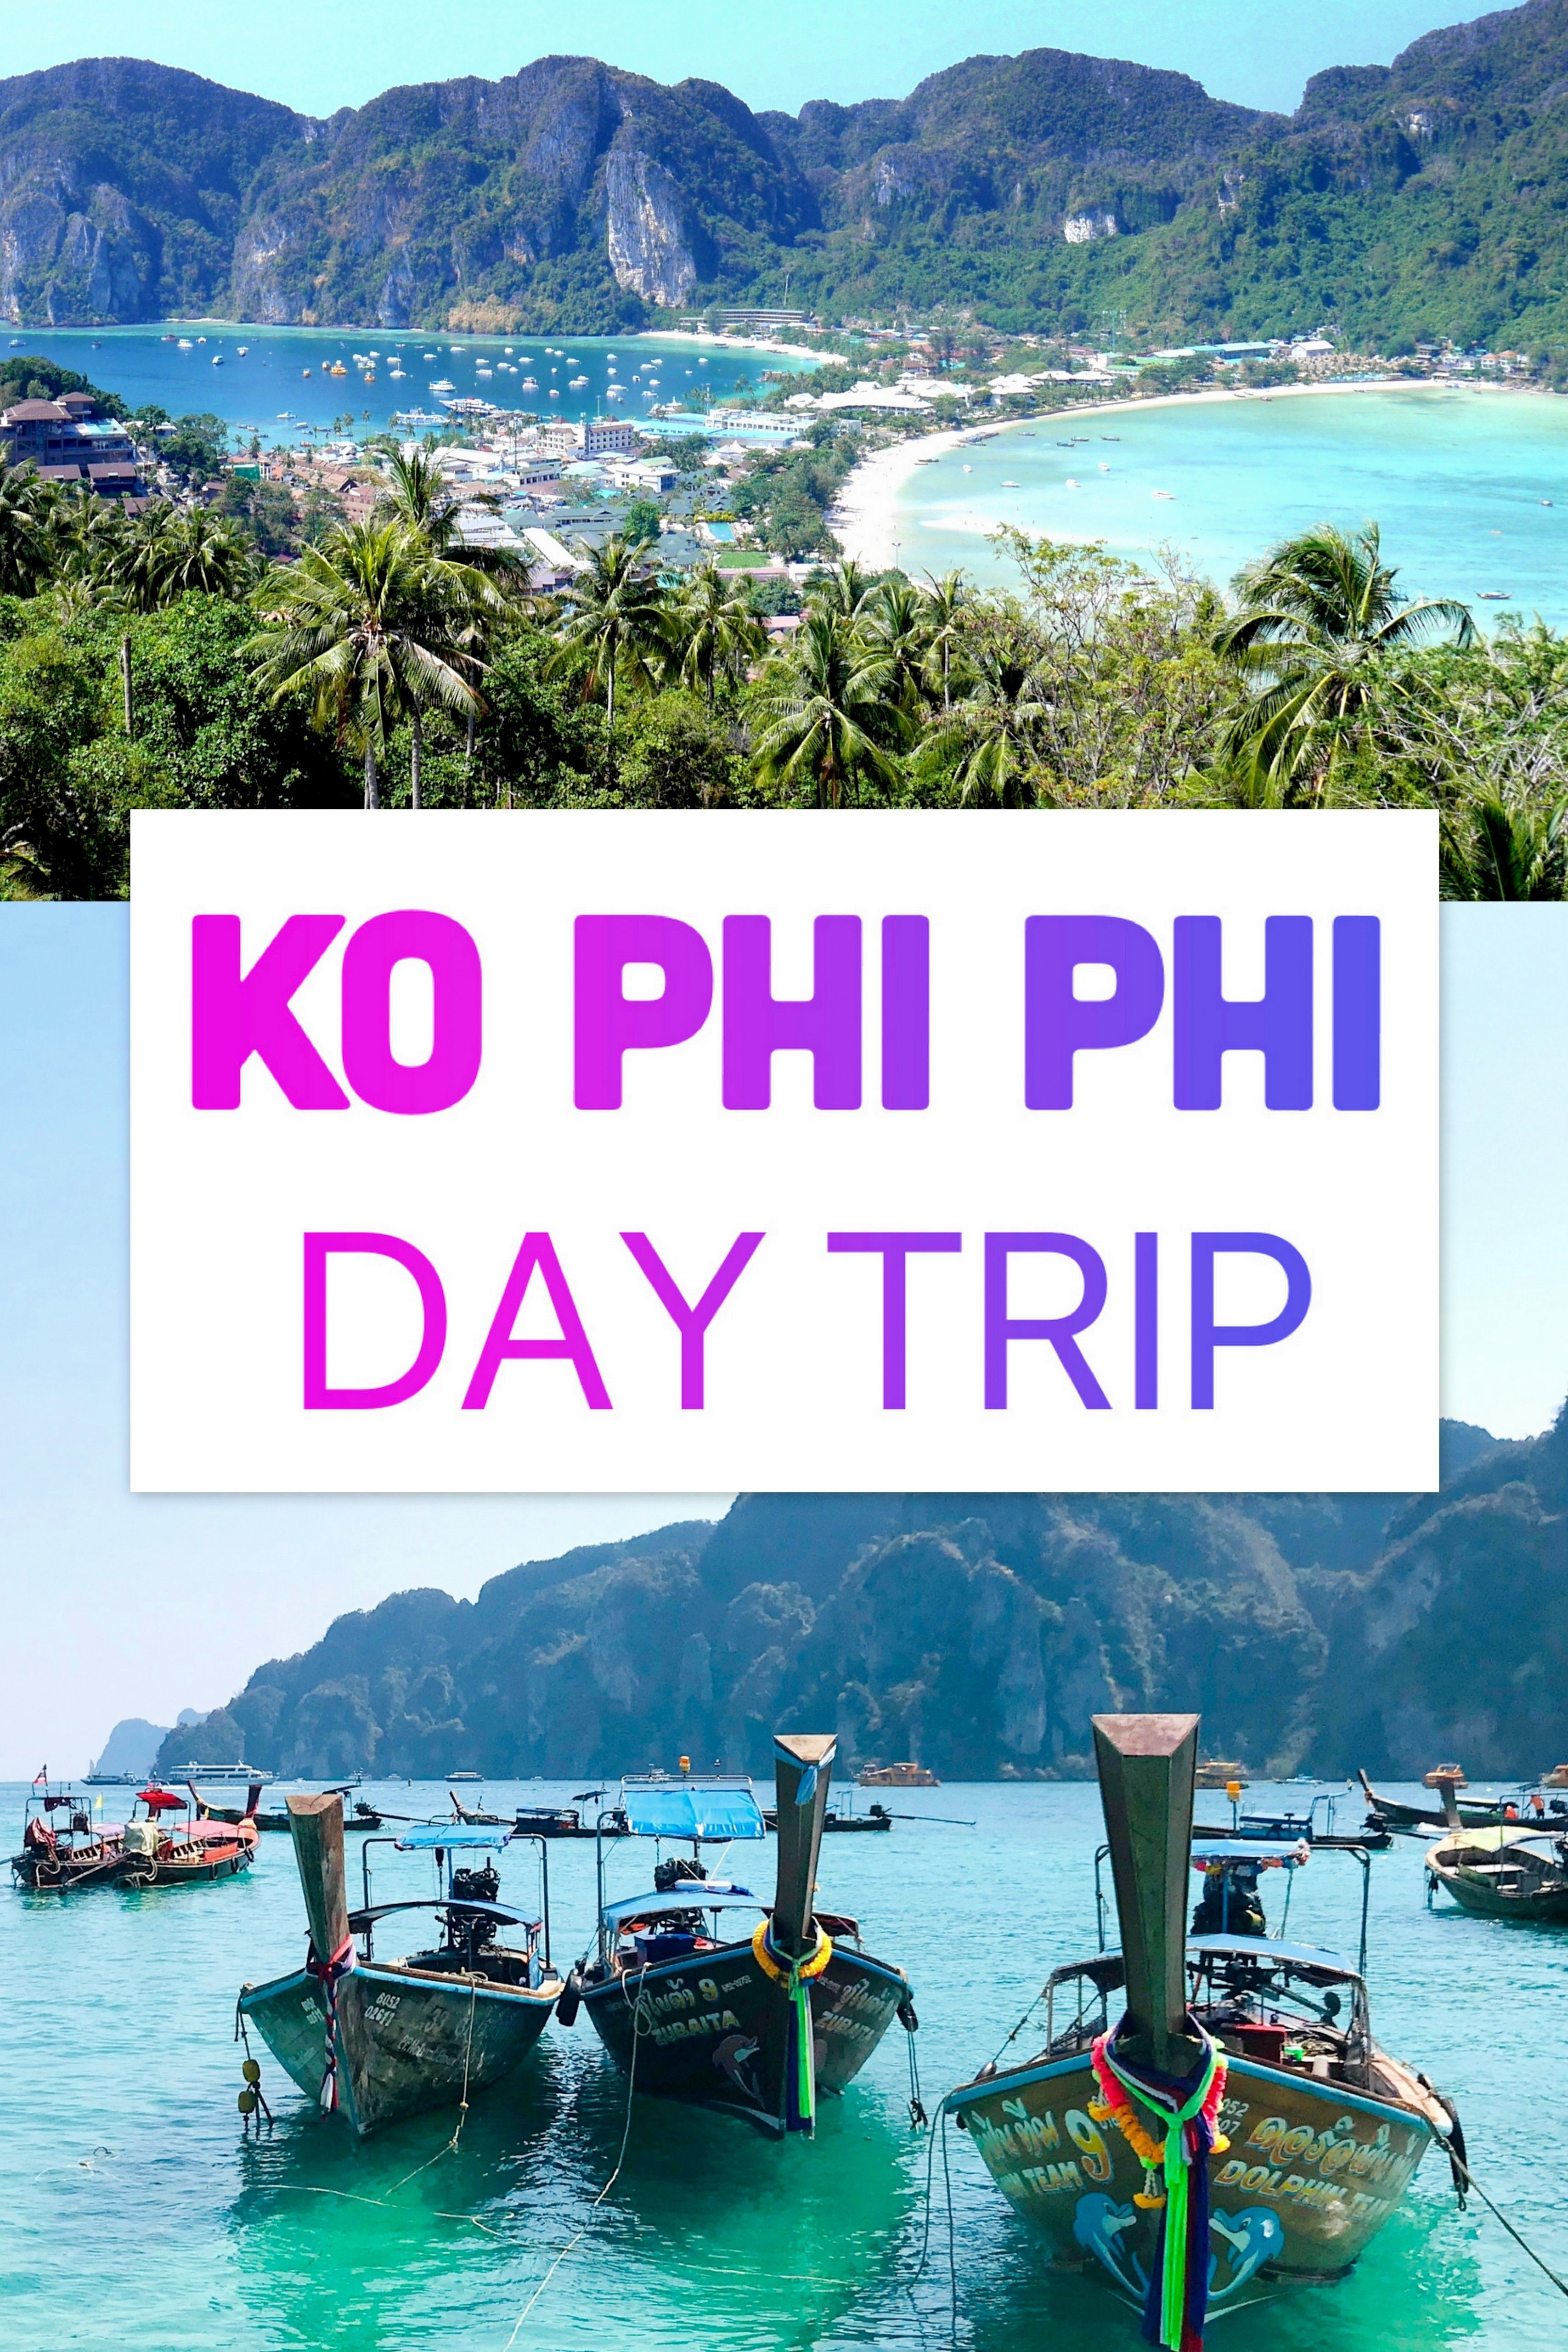 ac8818ce217d888e209461084a52f1f3 - How To Get From Phi Phi To Koh Lanta